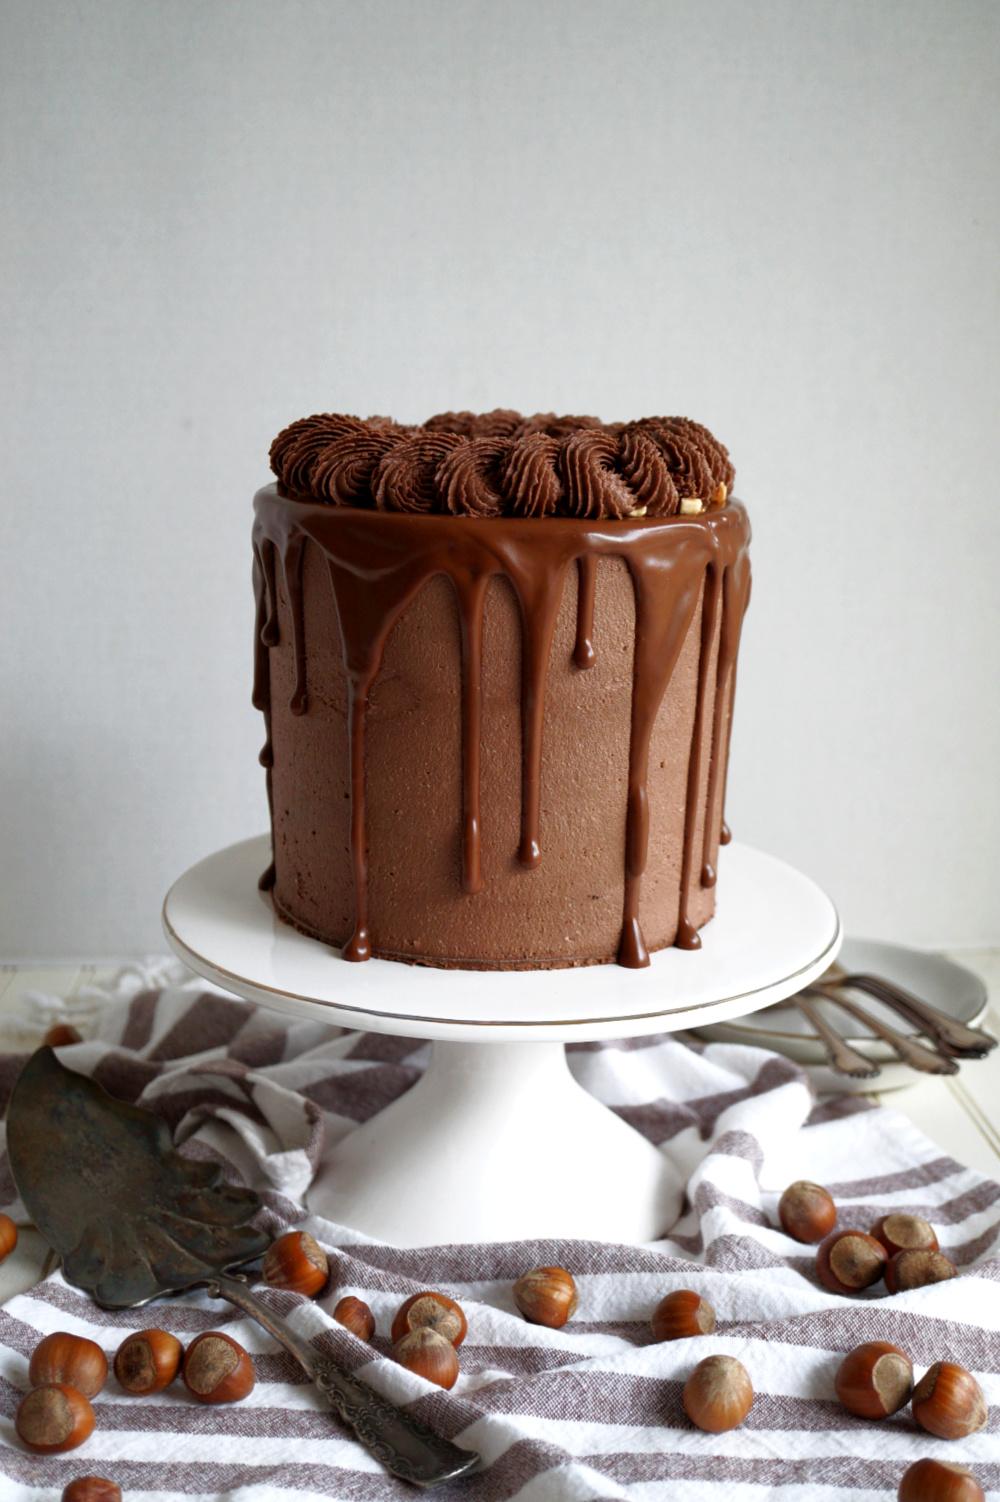 chocolate hazelnut layer cake on cake stand